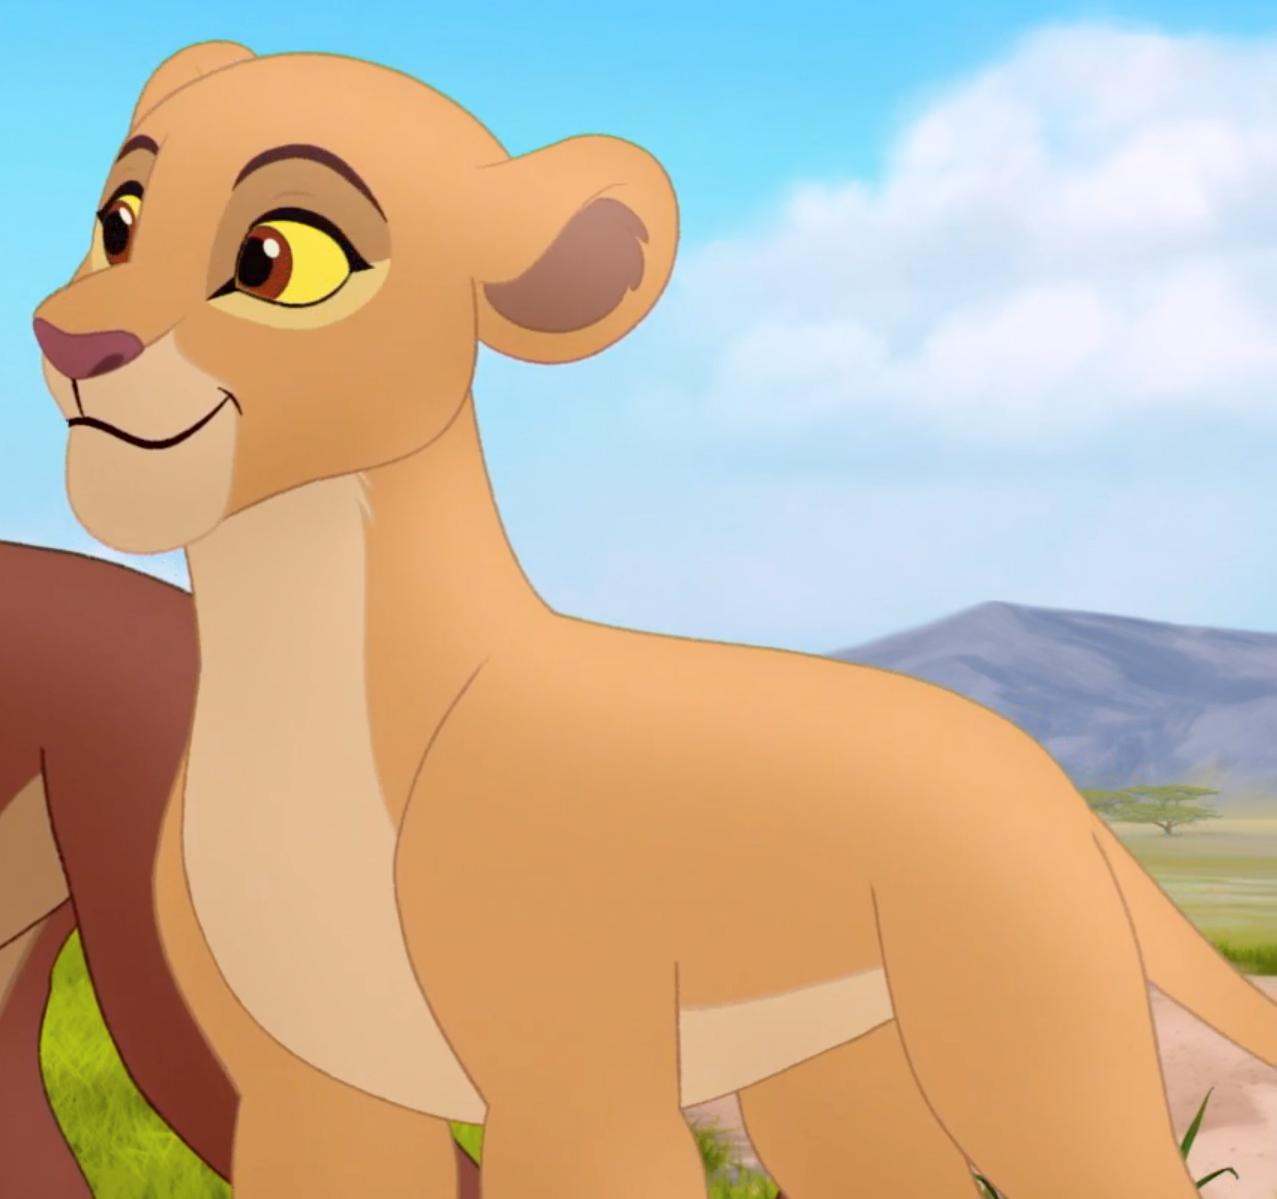 Kiara (The Lion King: Revisited) | The Lion King Fanon